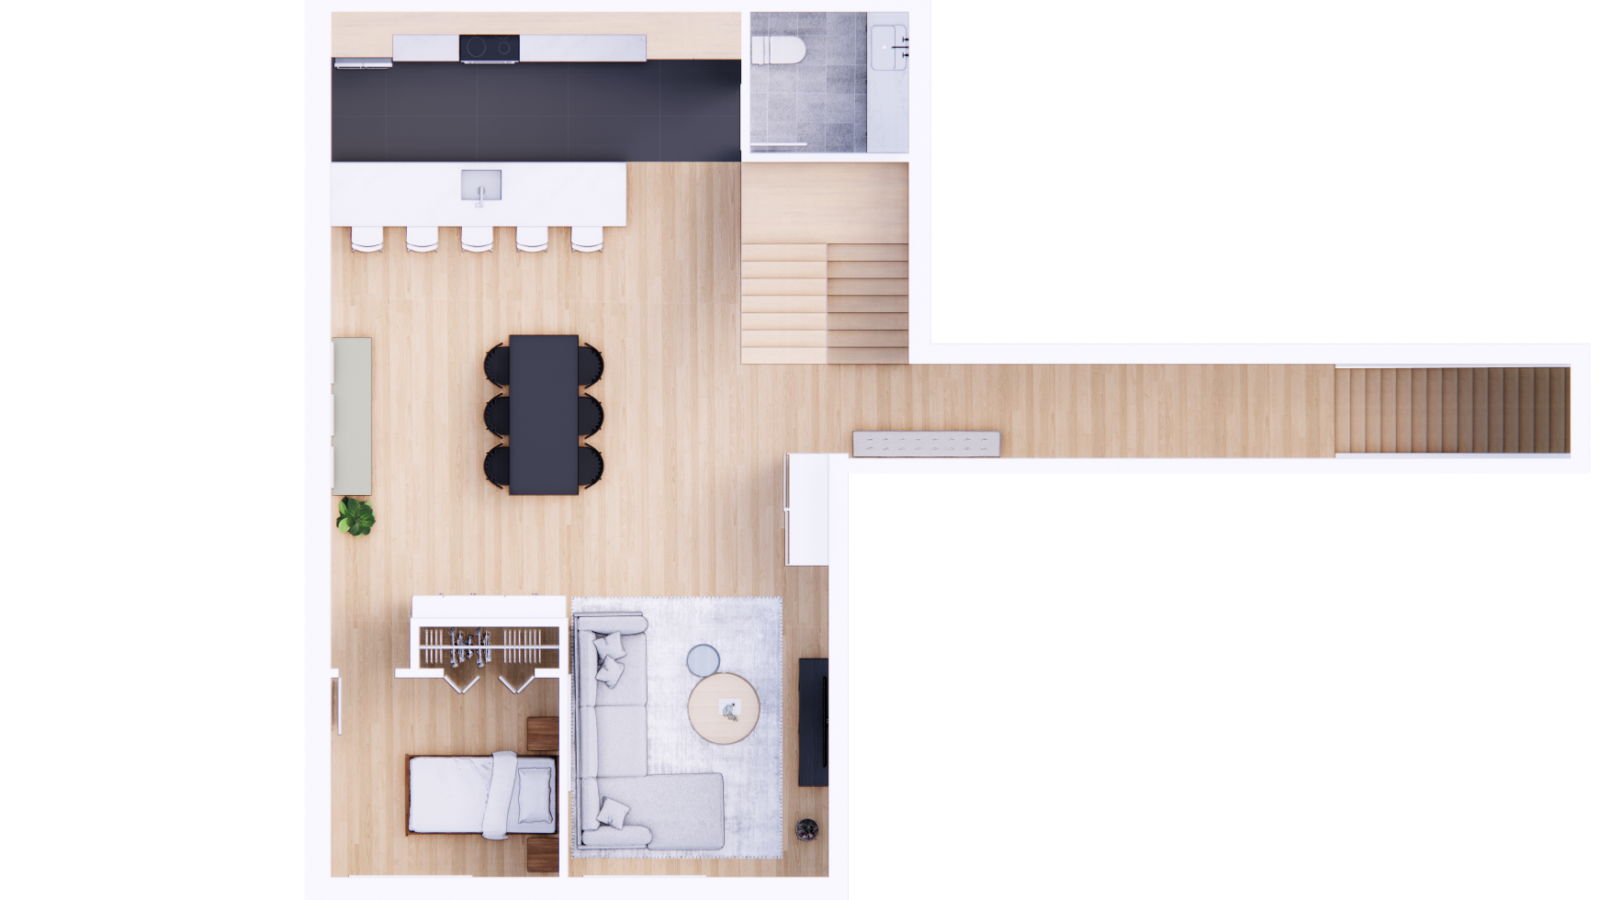 Humaco_Maison9_Plan-niveau 2(3)